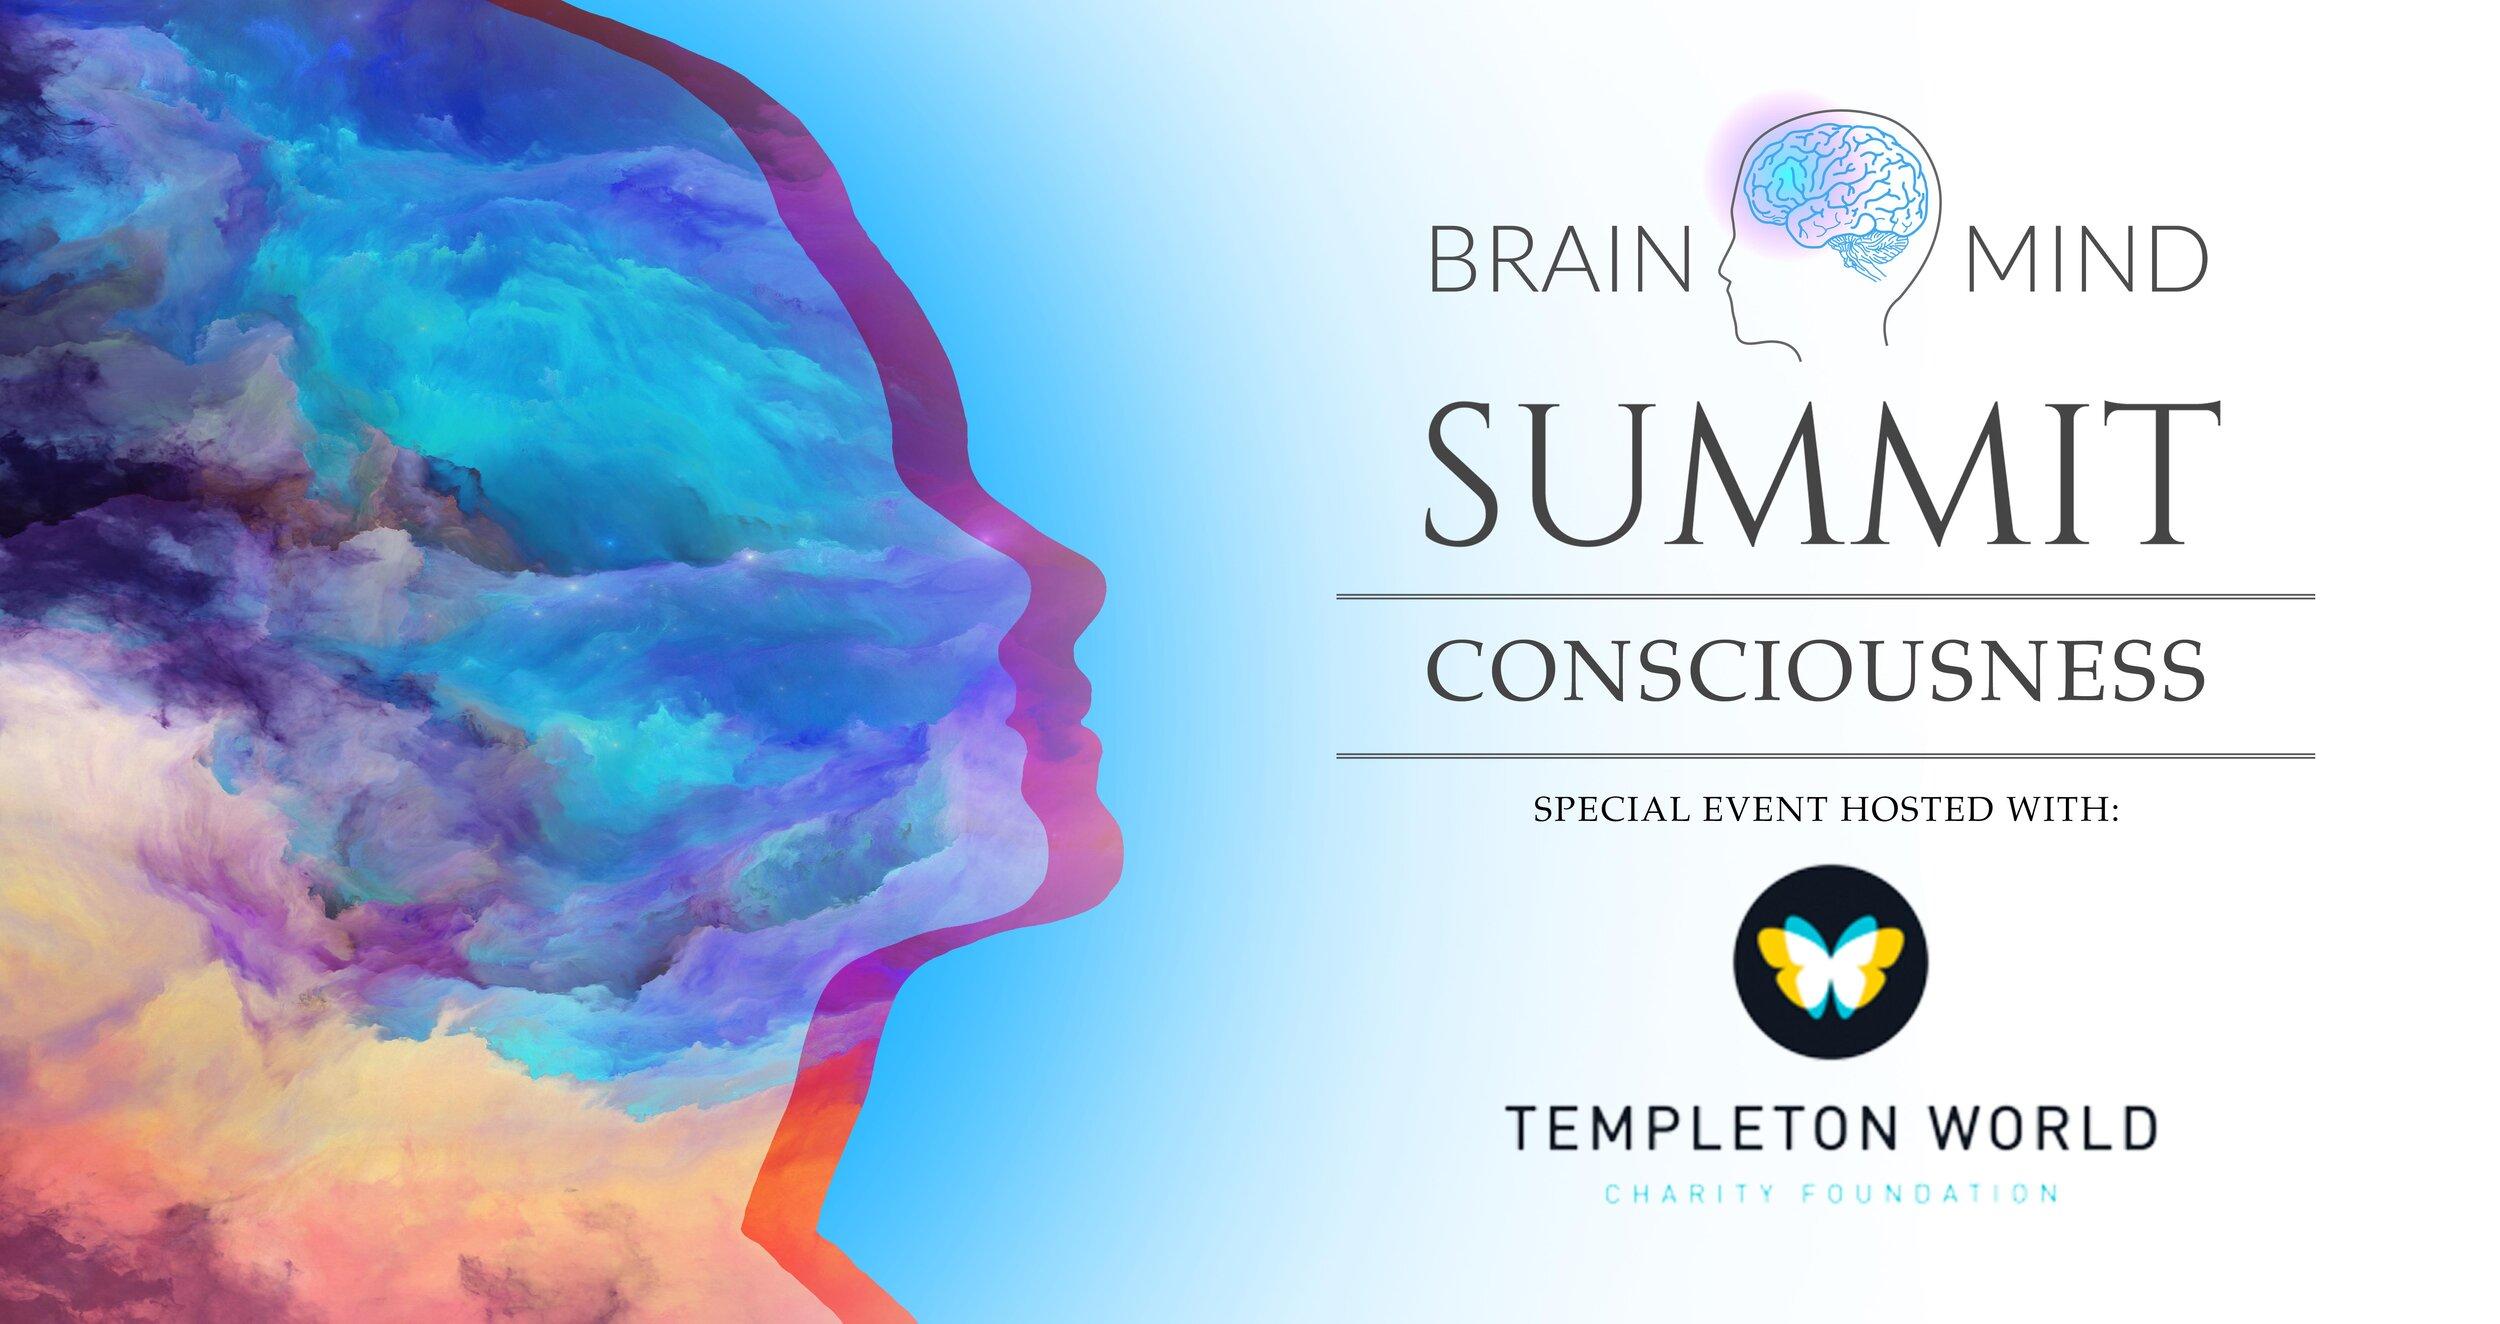 BrainMind_Stanford_2019_CONSCIOUSNESS.jpg